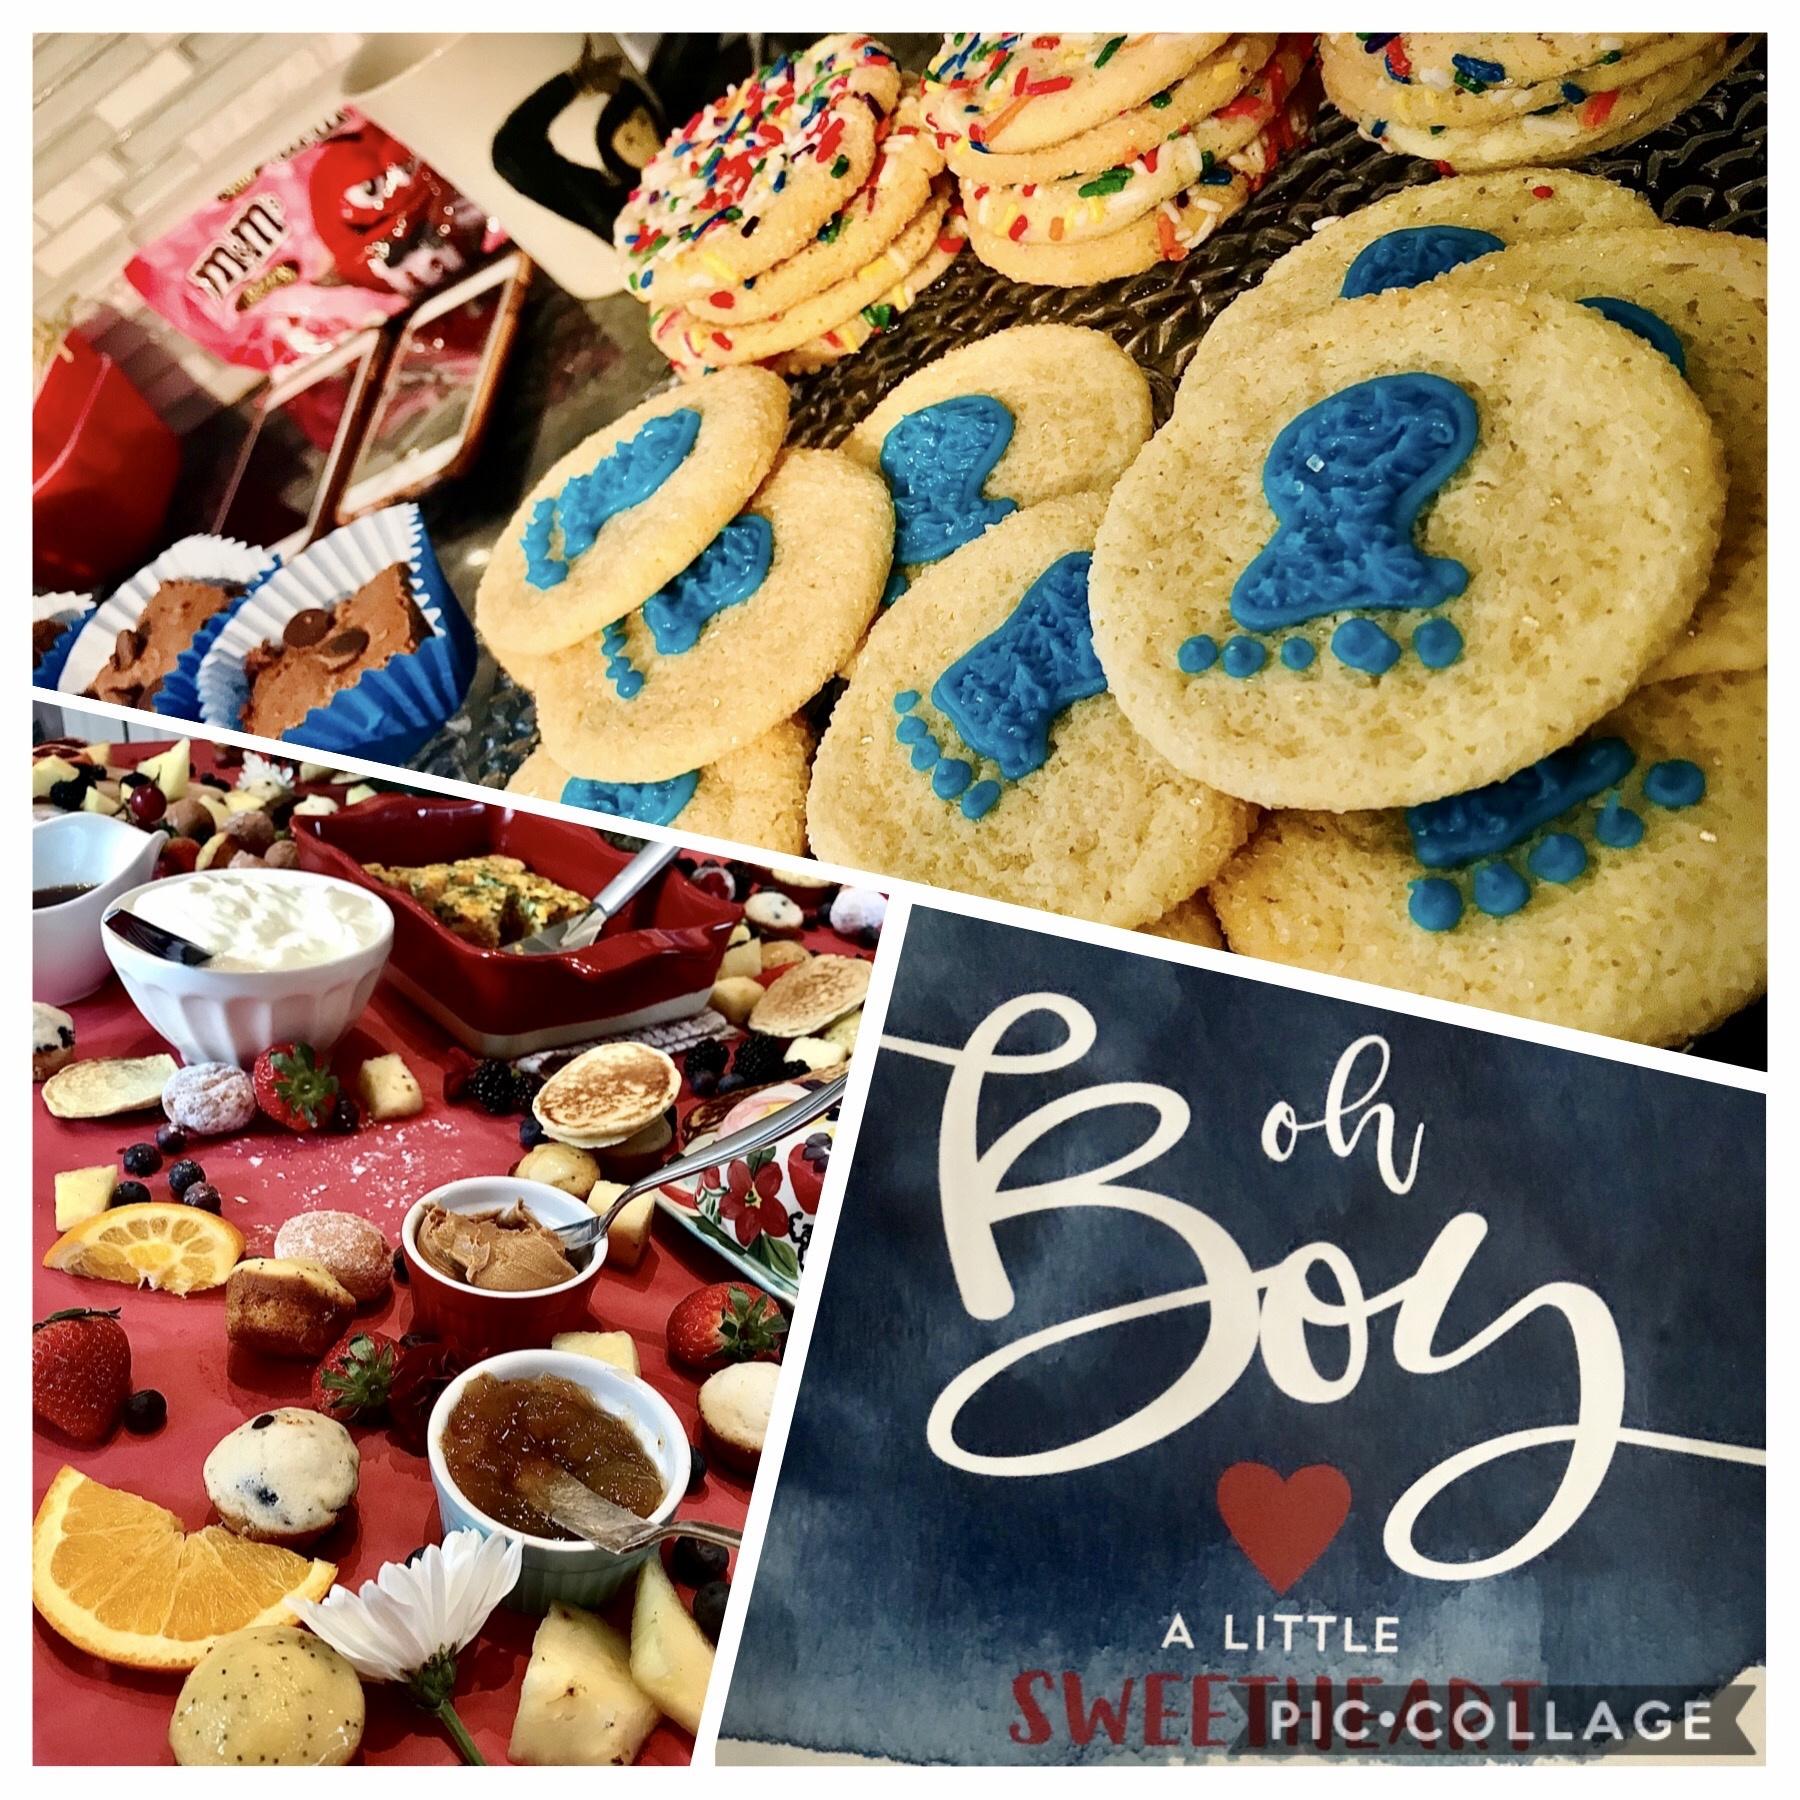 Catered Cookies, Brownies and Rice Krispies